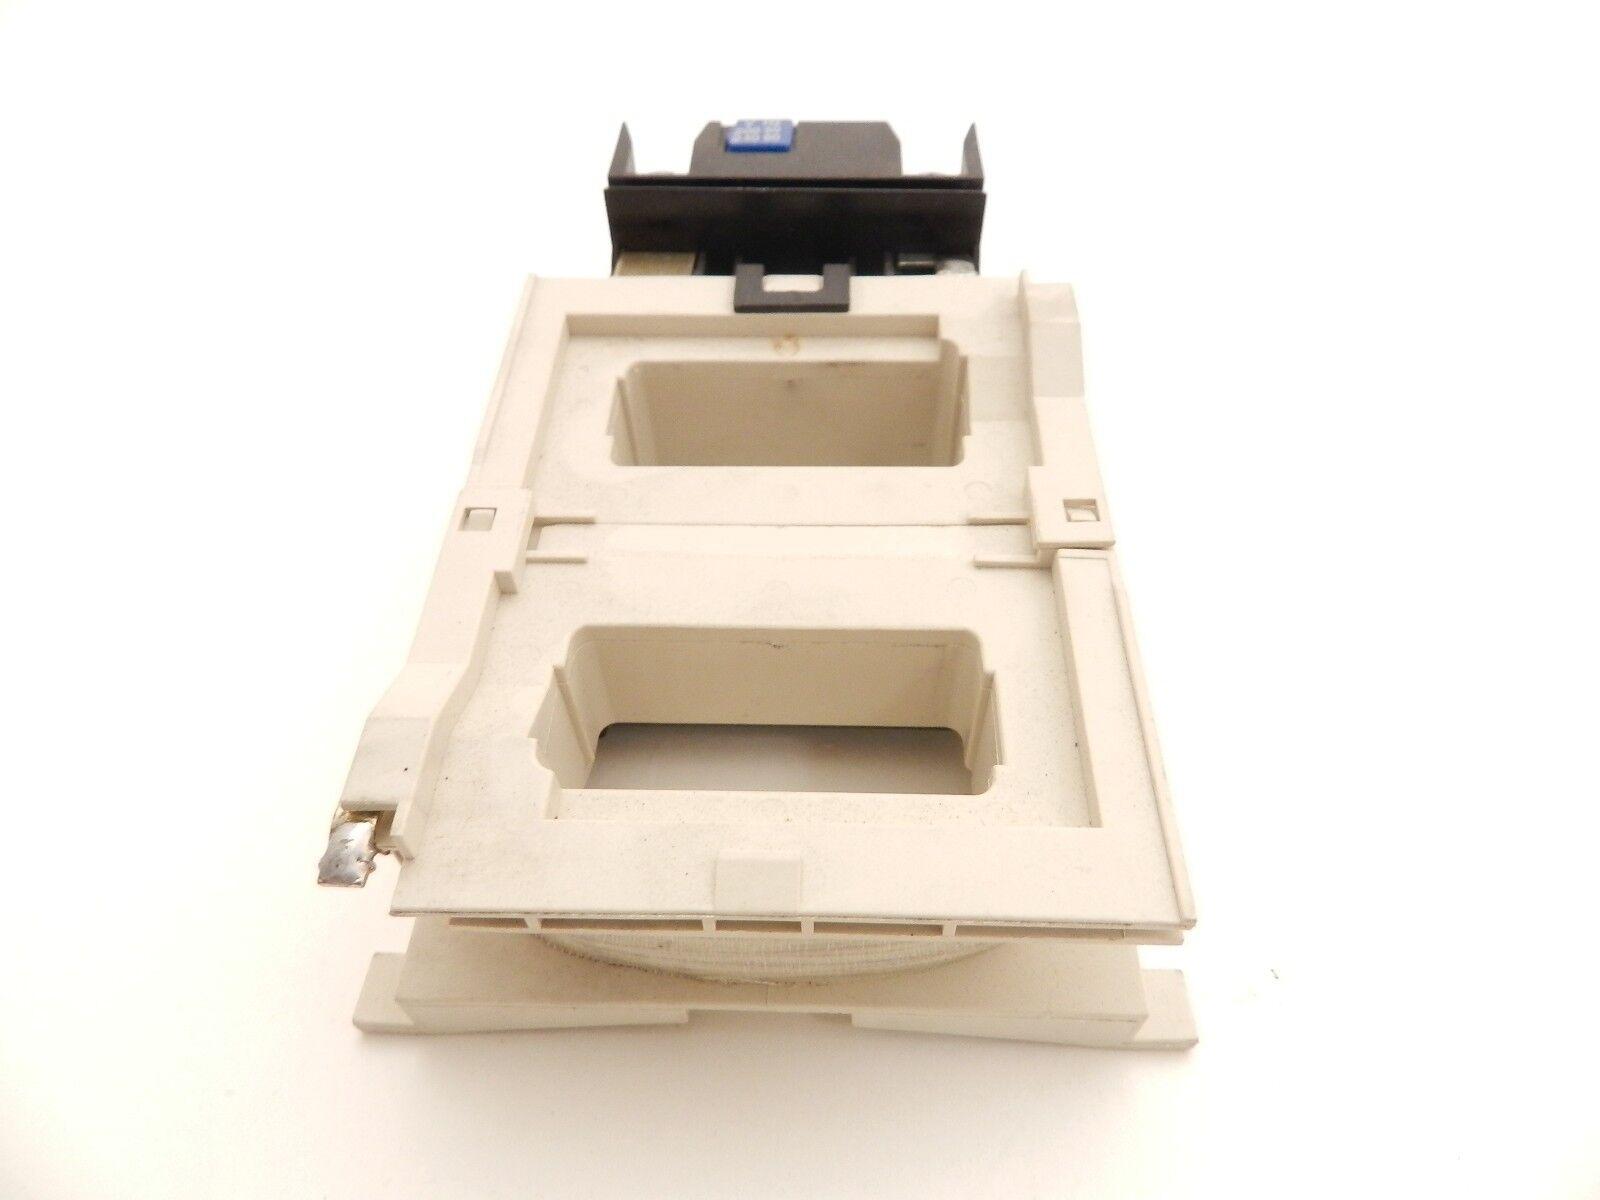 CO-3TF49-480V FITS SIEMENS MAGNETIC COIL 3TY7483-0AQ0 480V  3TF48-49 CONTACTORS